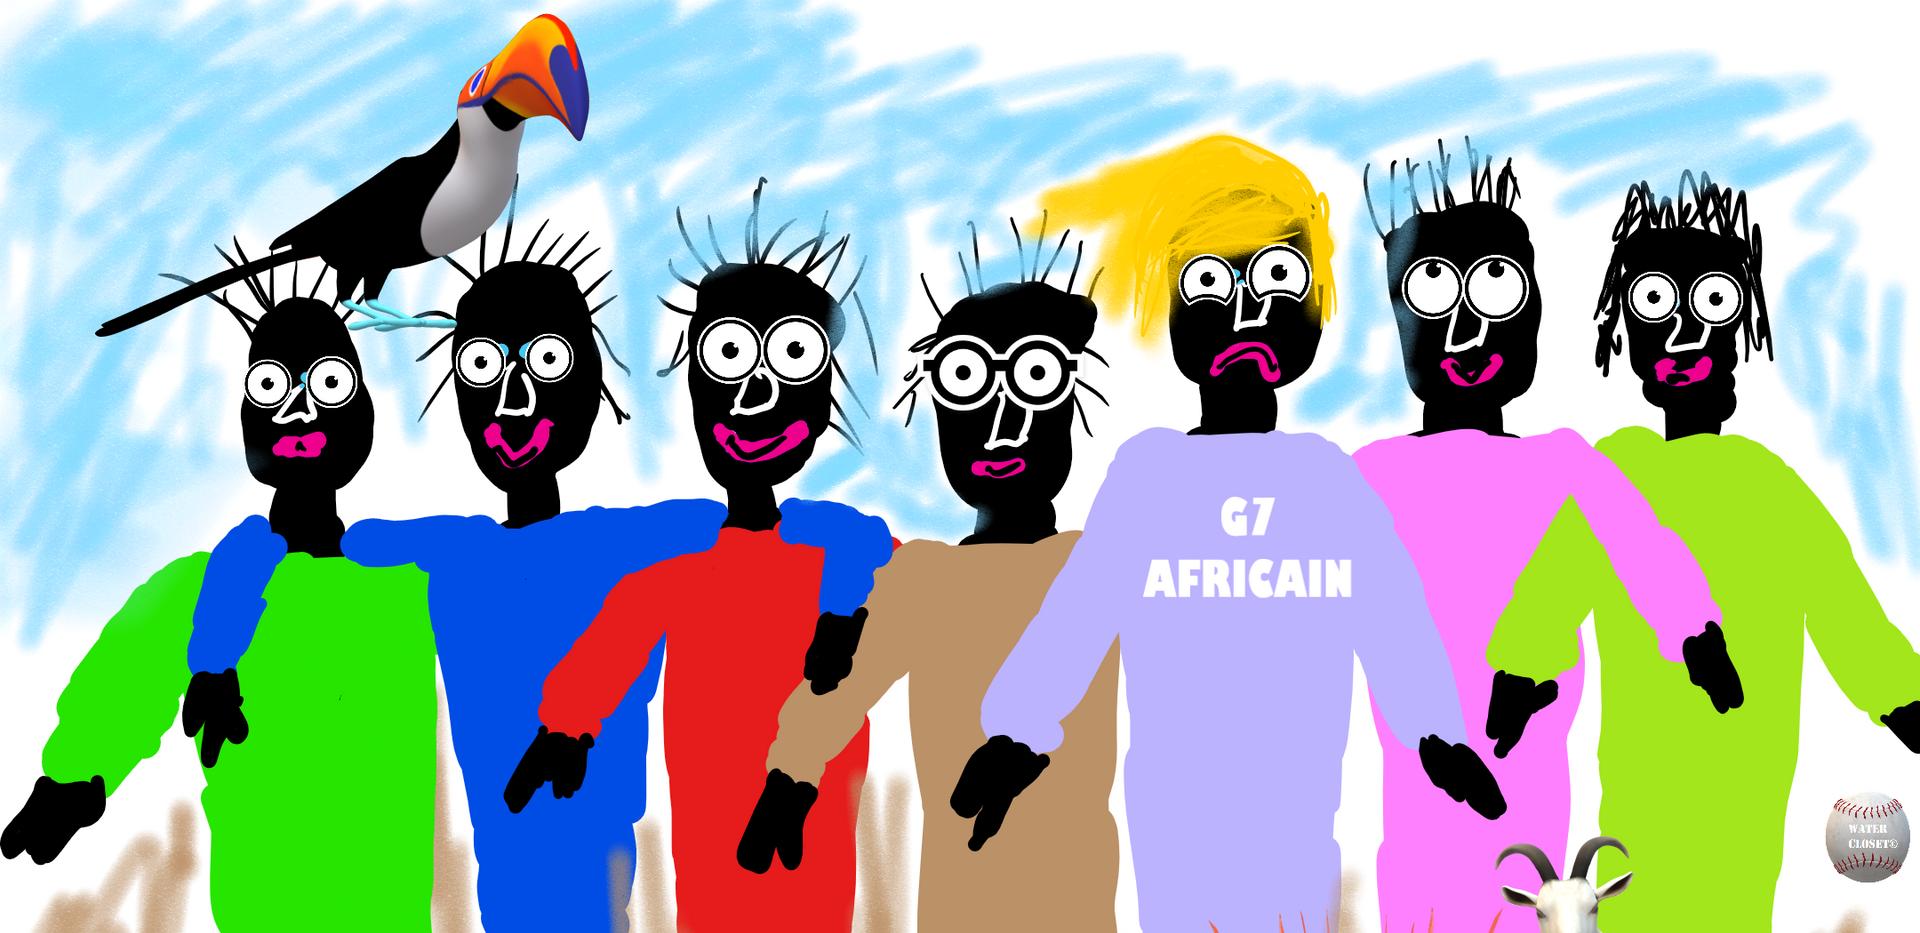 G7 AFRICAIN - WATER CLOSET©